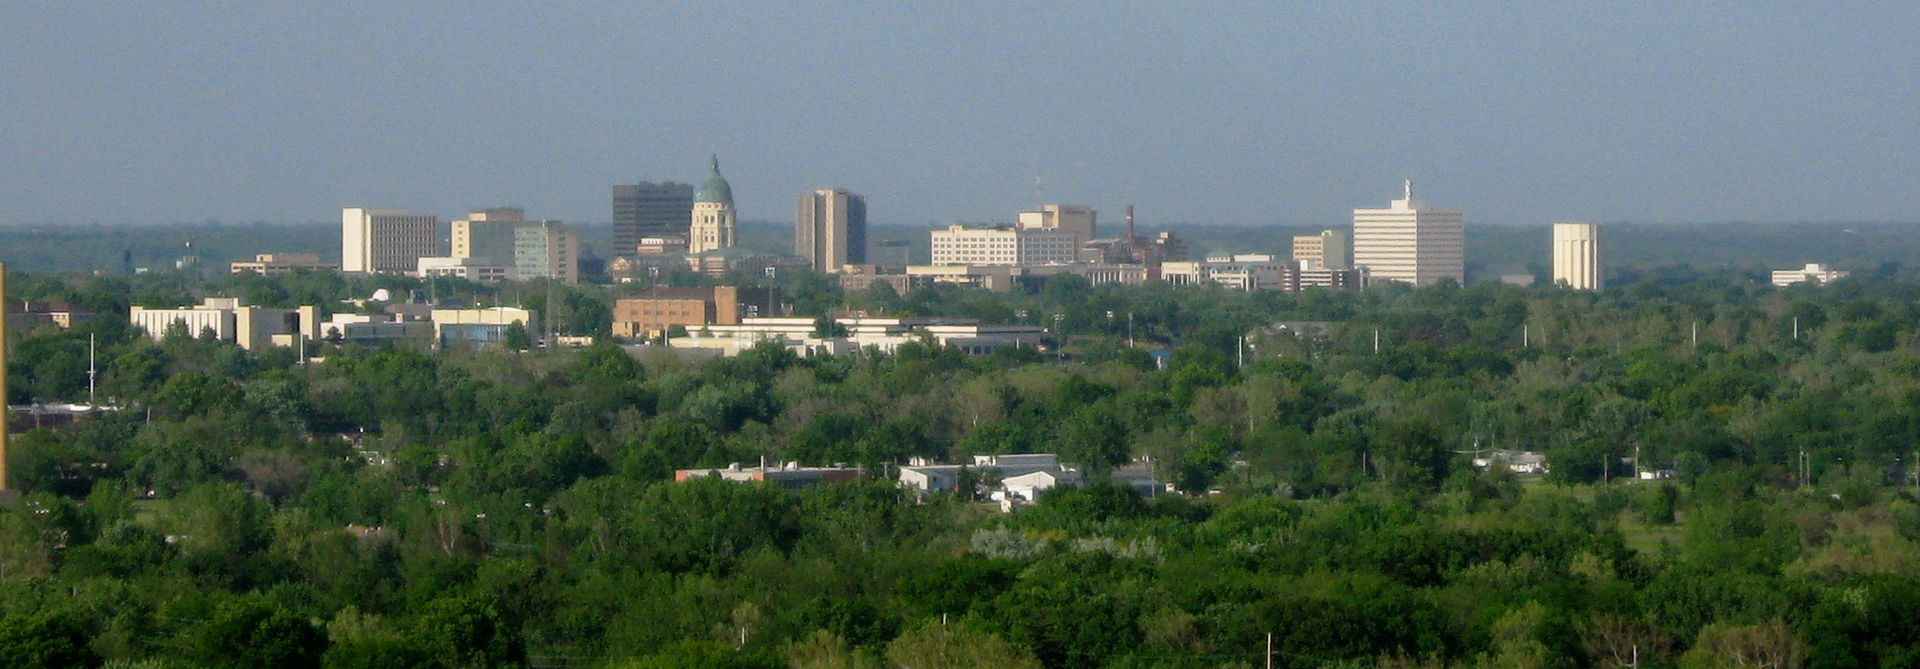 Topeka, Kansas.JPG